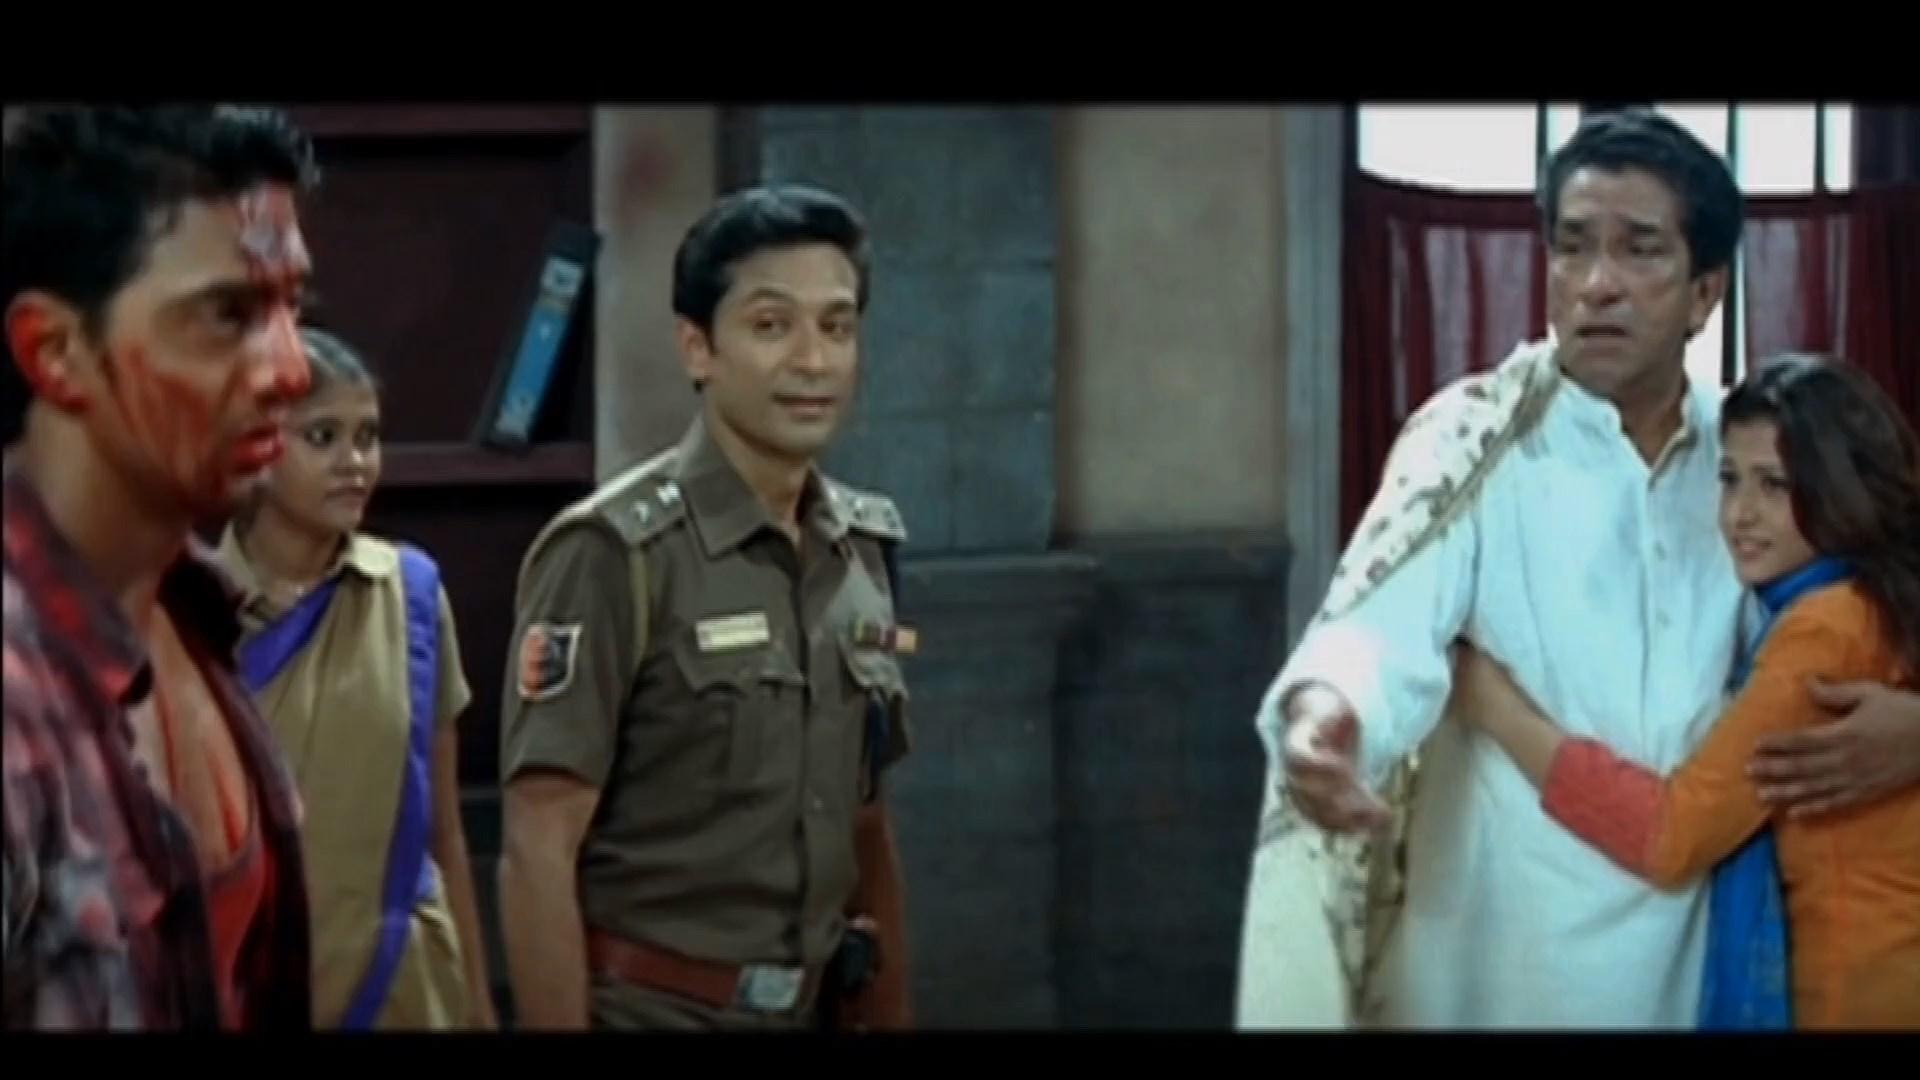 Bolo.Na.Tumi.Amar.2010.Bengali.1080p.Hotstar.WEB DL.AVC.AAC2.0.x264.ESub [ShiN0bi] .mkv snapshot 02.